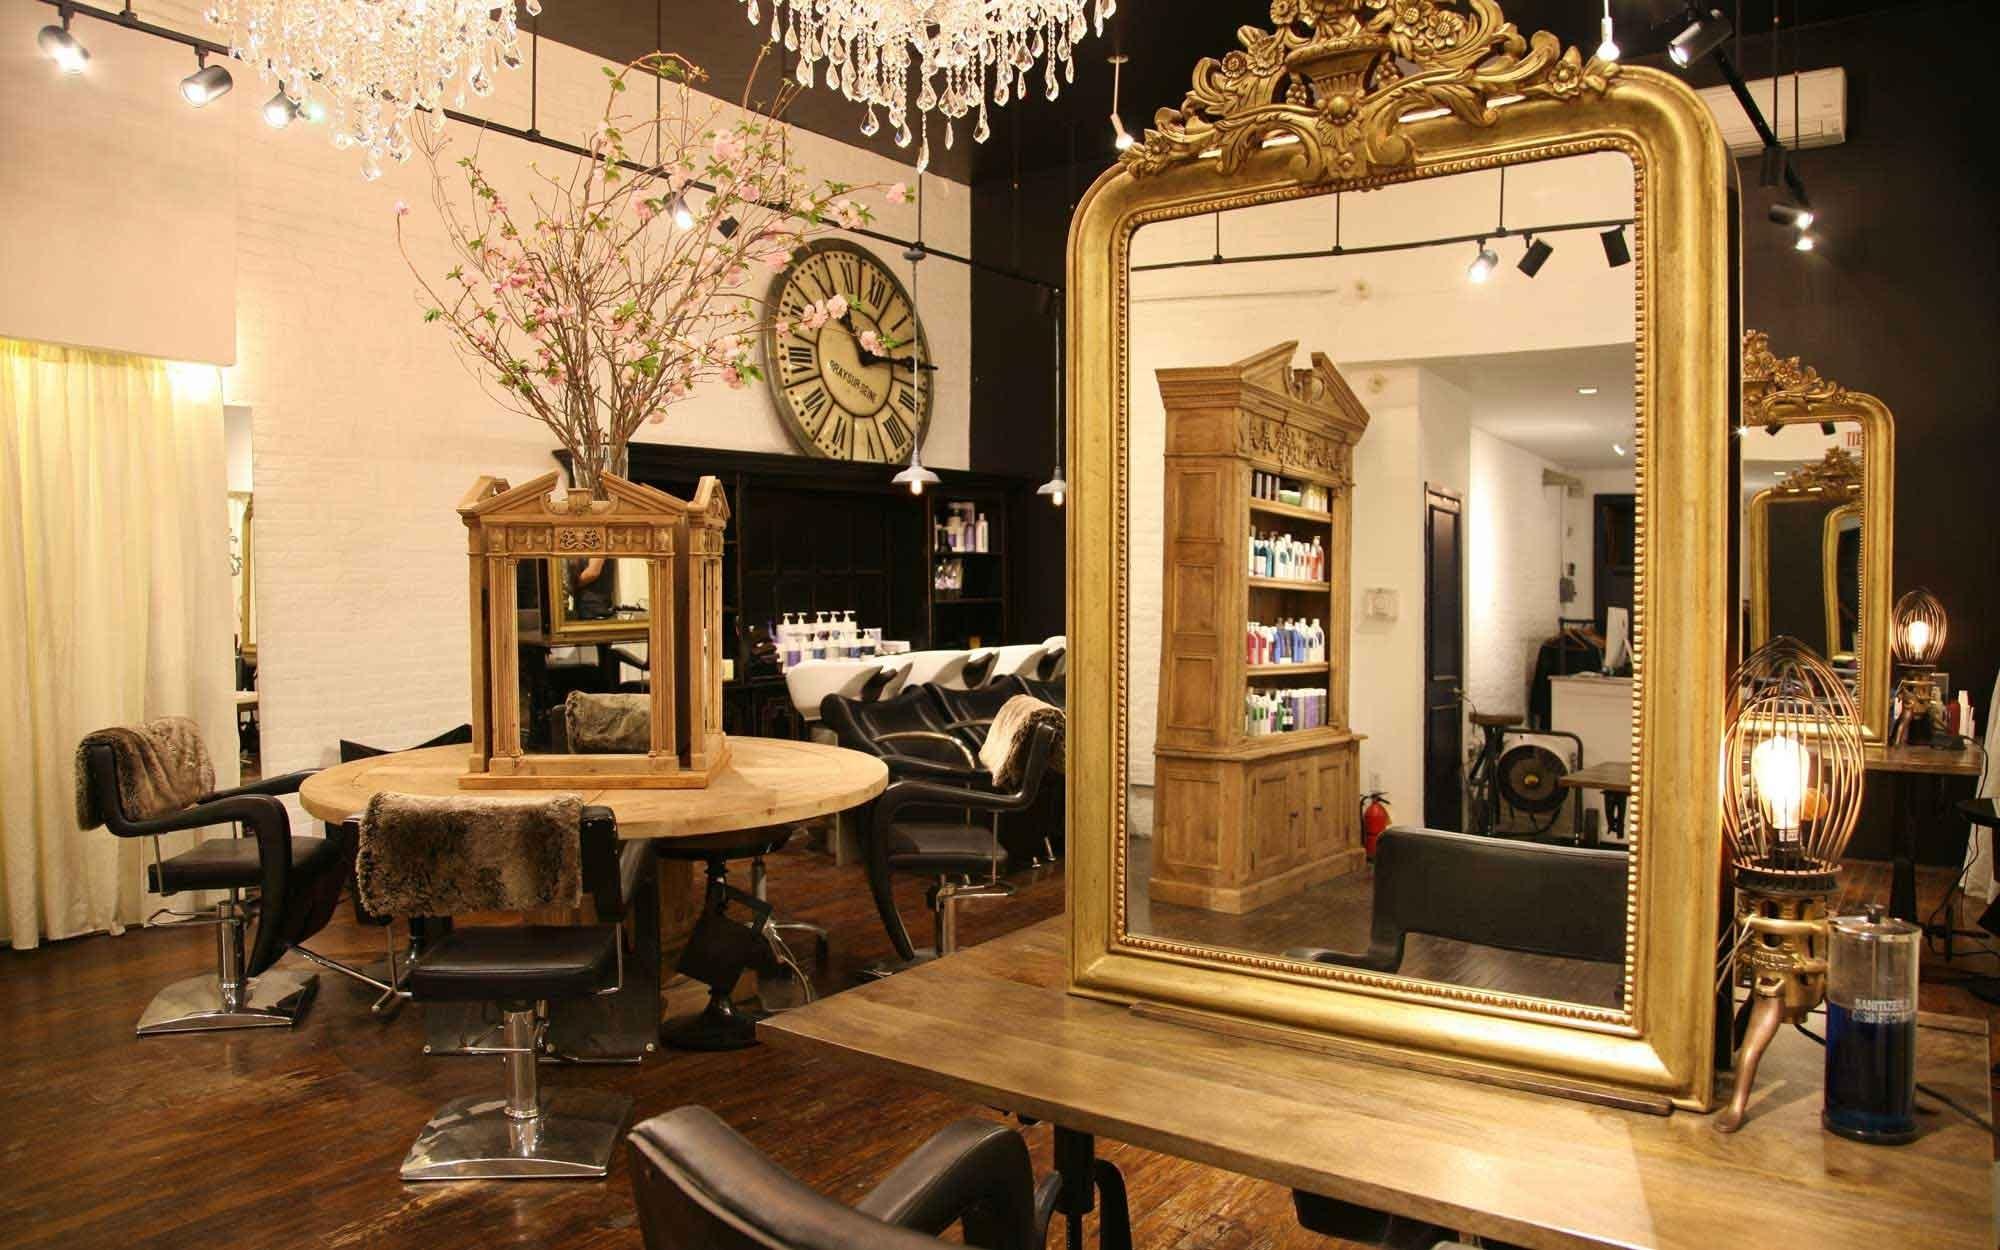 Best Haircut Salon New York Wavy Haircut